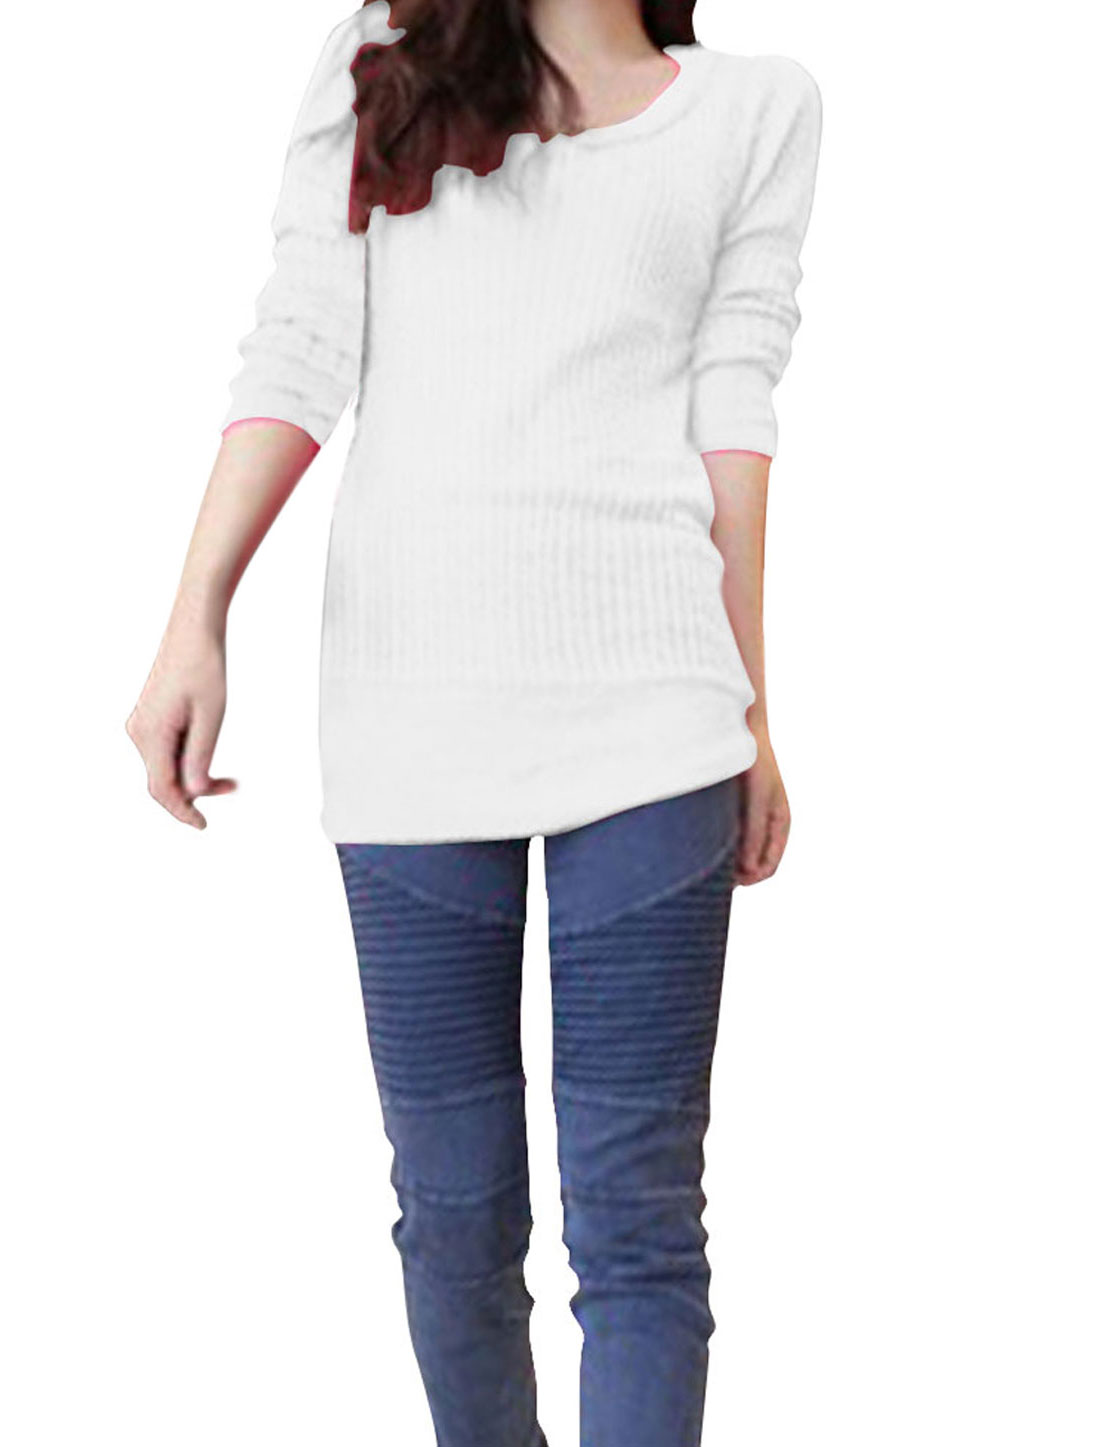 Ladies White Long Sleeve Elastic Cuff Ribbing Leisure Autumn Top Shirt XS